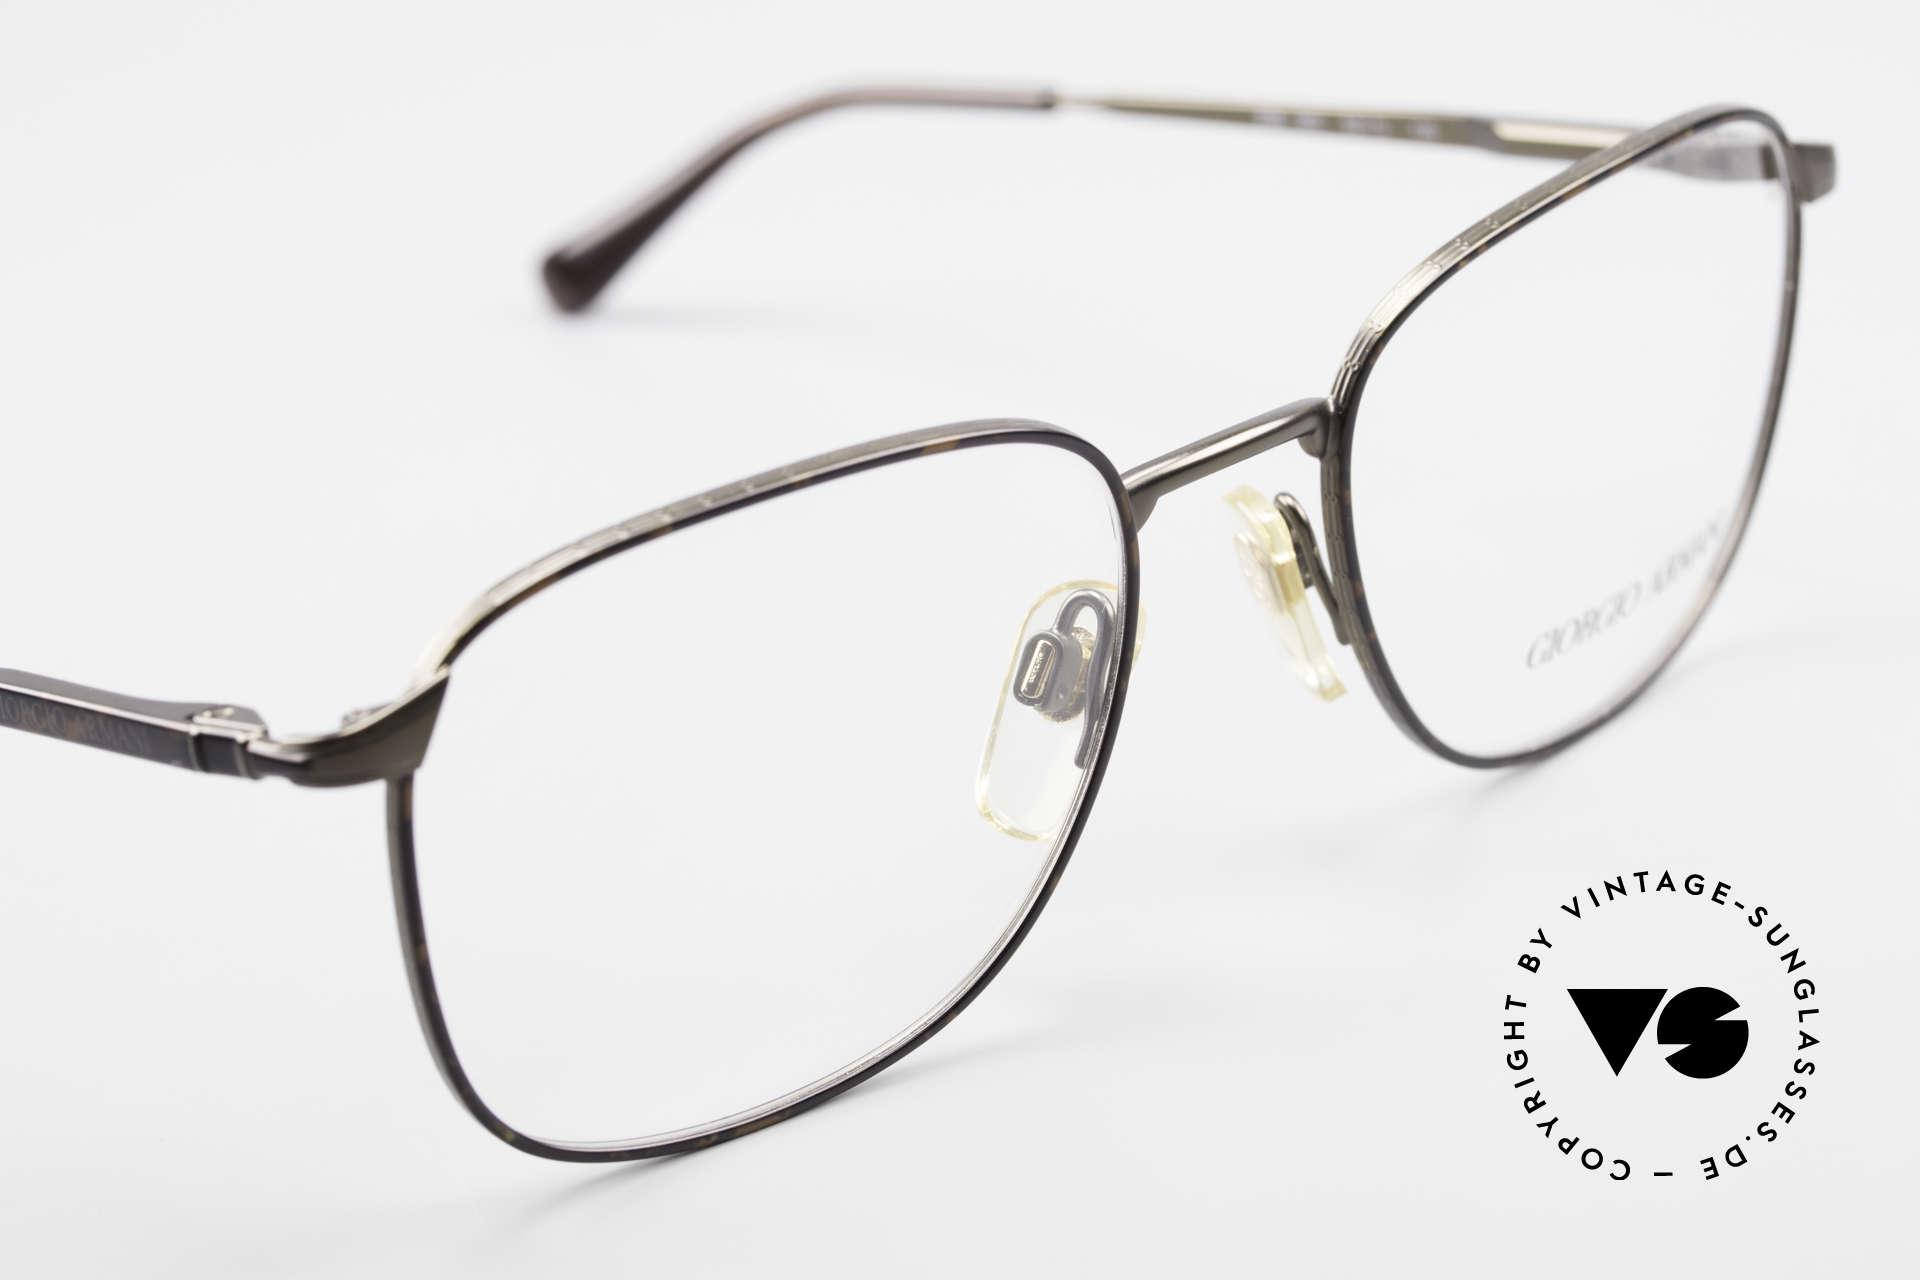 Giorgio Armani 236 Square Panto Vintage Frame, unworn (like all our vintage GIORGIO Armani frames), Made for Men